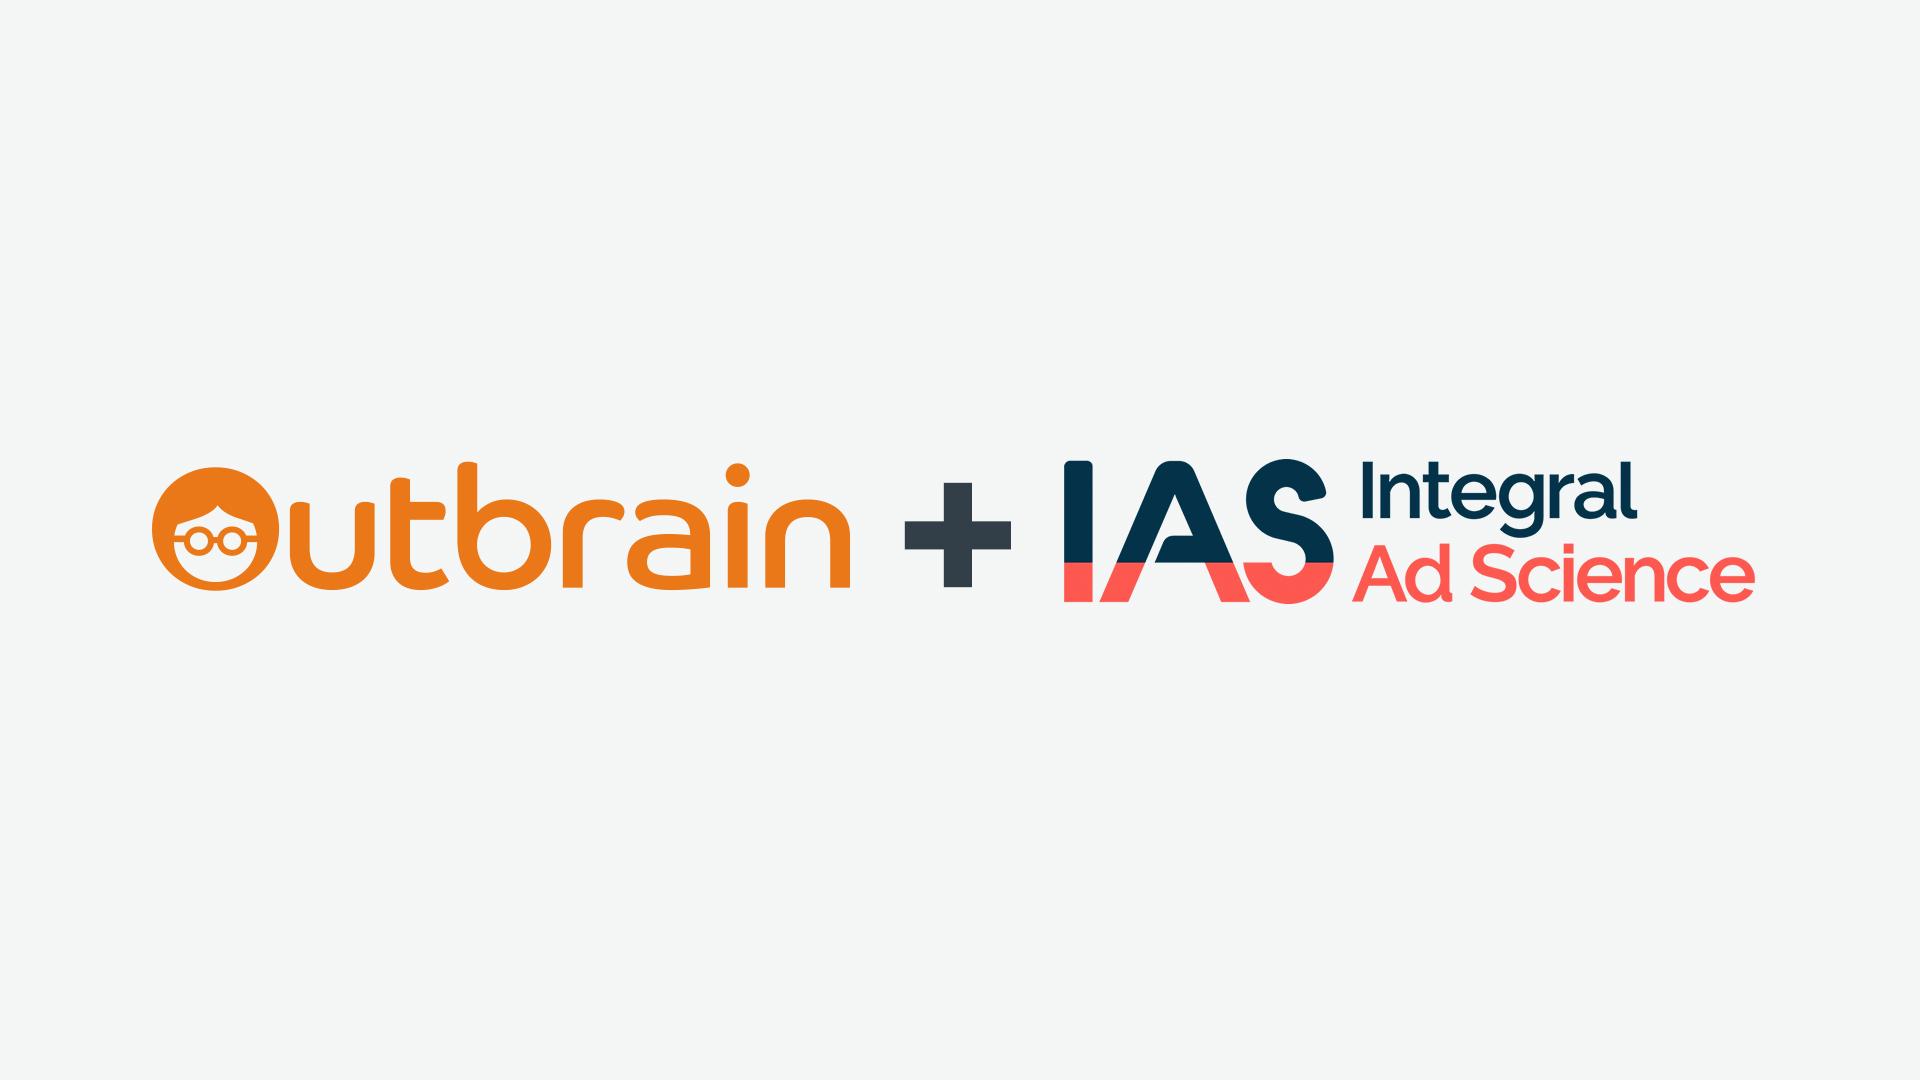 Outbrain IAS